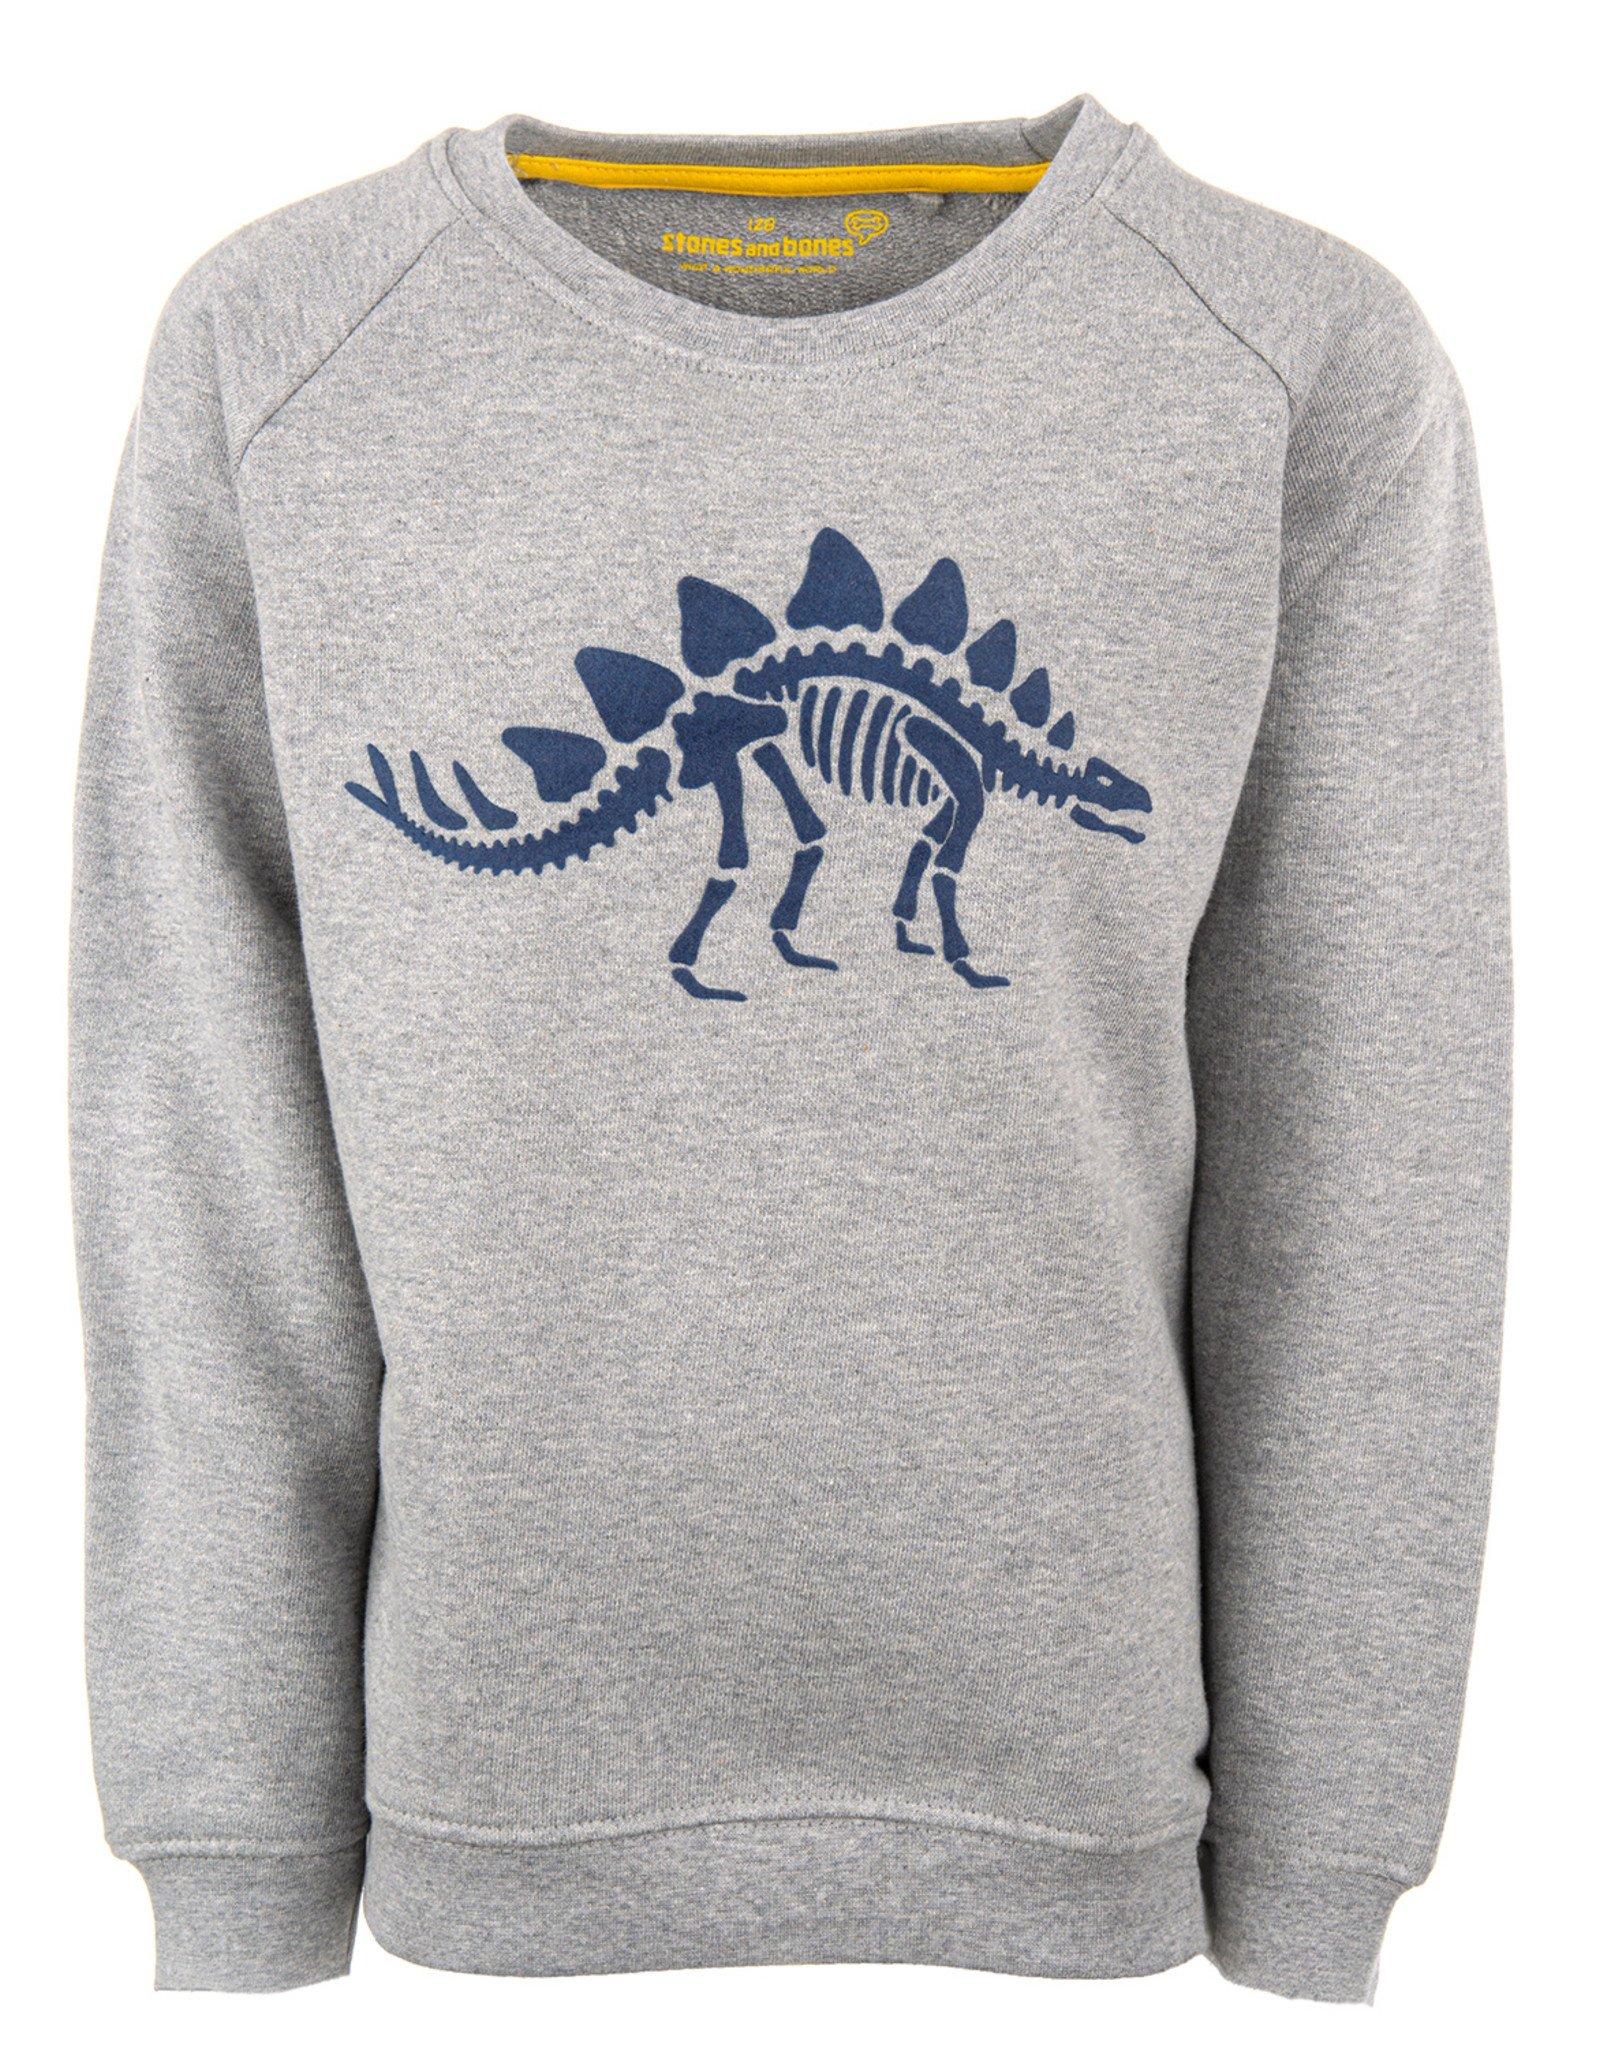 Stones and Bones Stones and Bones 'Imagine' Dino grey sweatshirt